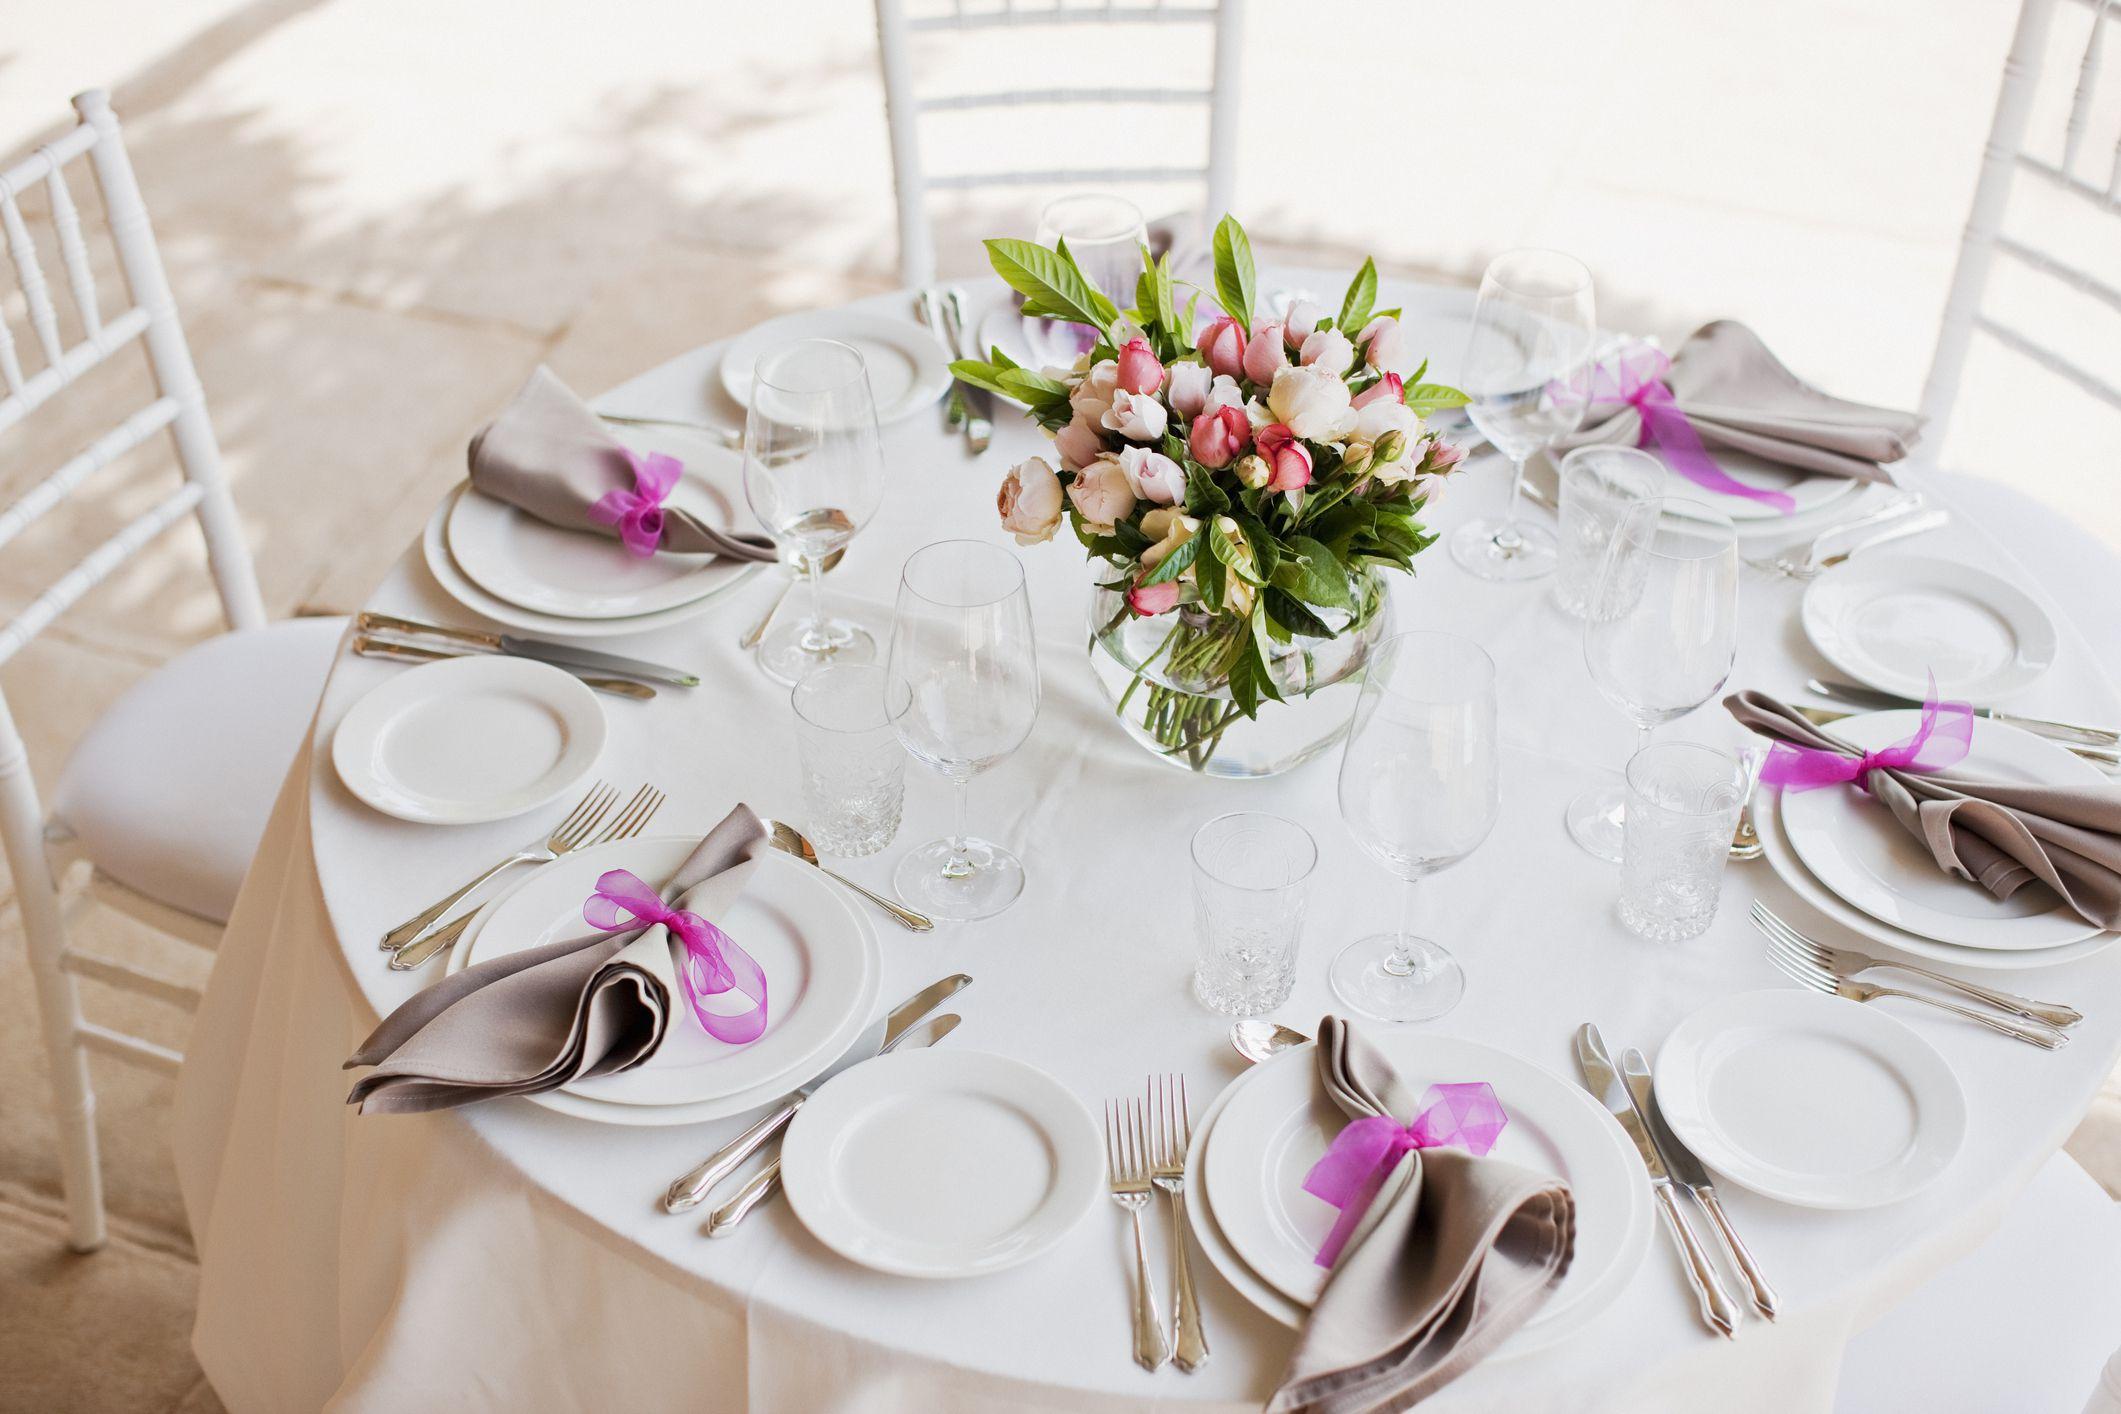 Украсить стол на свадьбу в домашних условиях фото